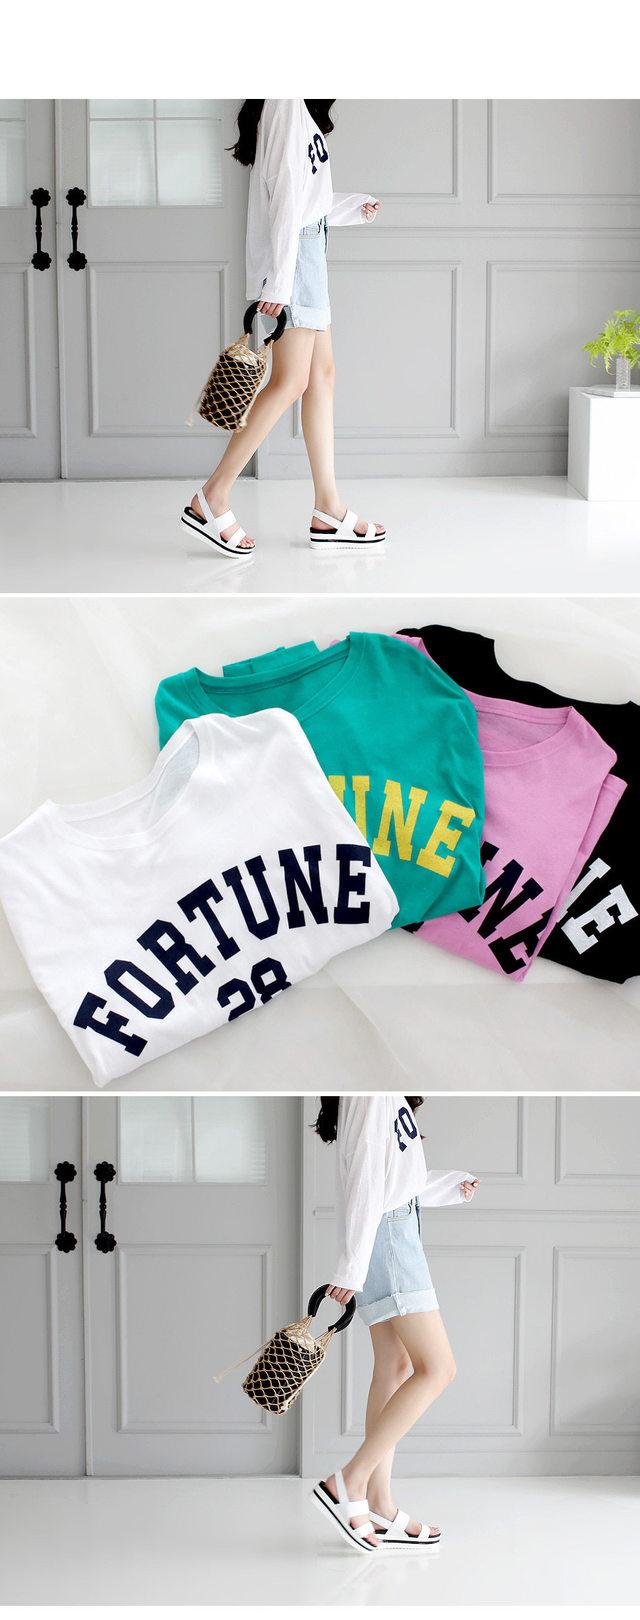 Potton t-shirt